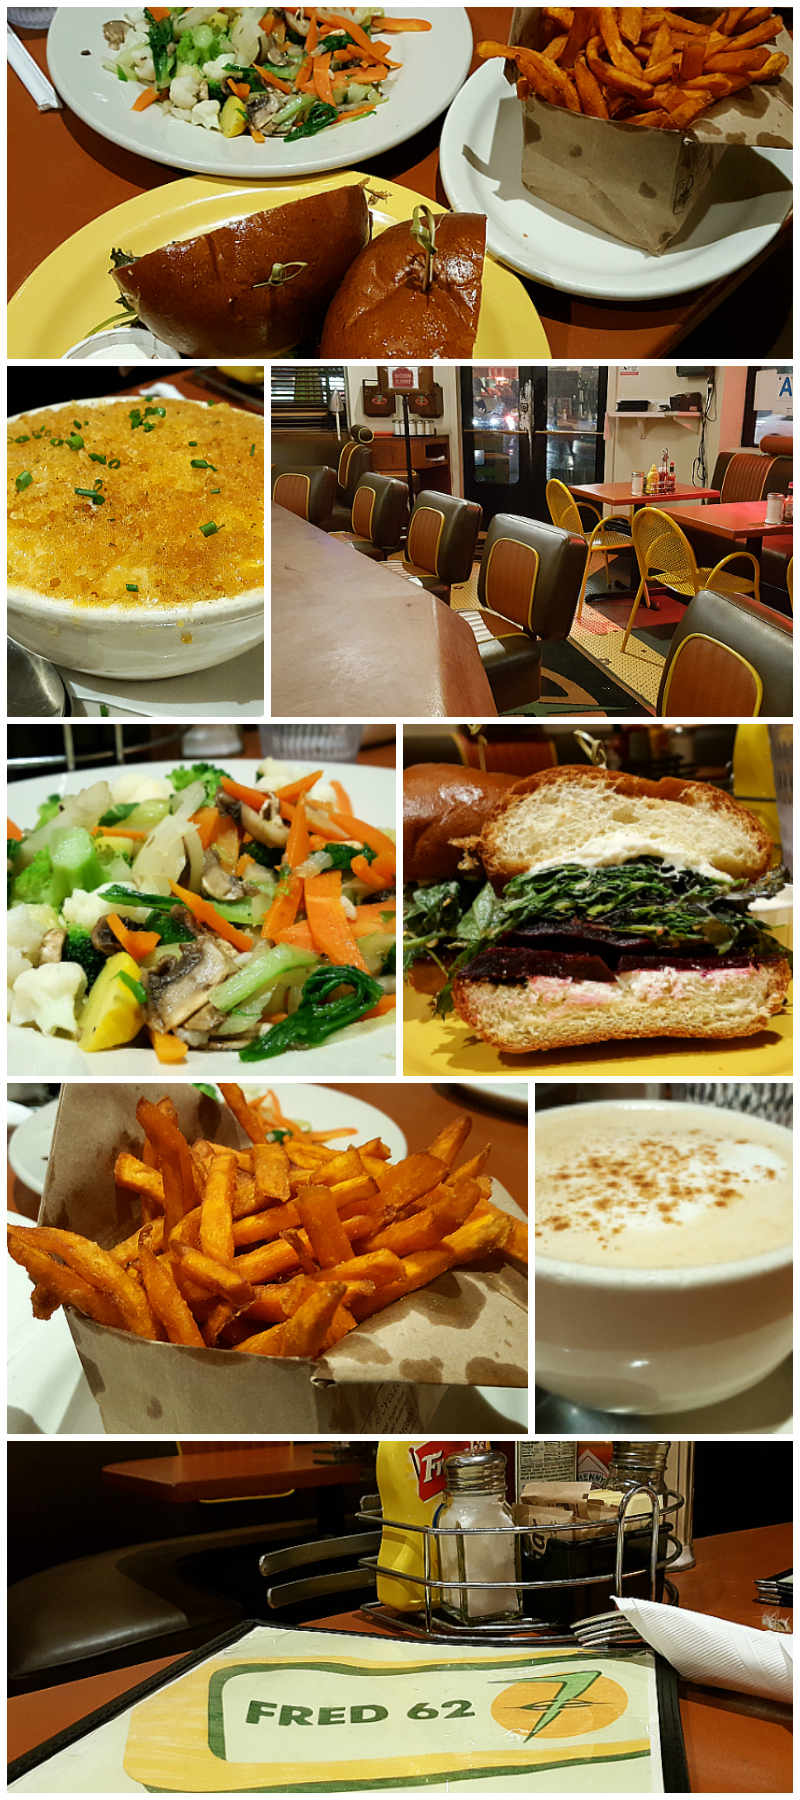 Fred 62 - 24 Hour Diner in Los Feliz - Los Angeles, California